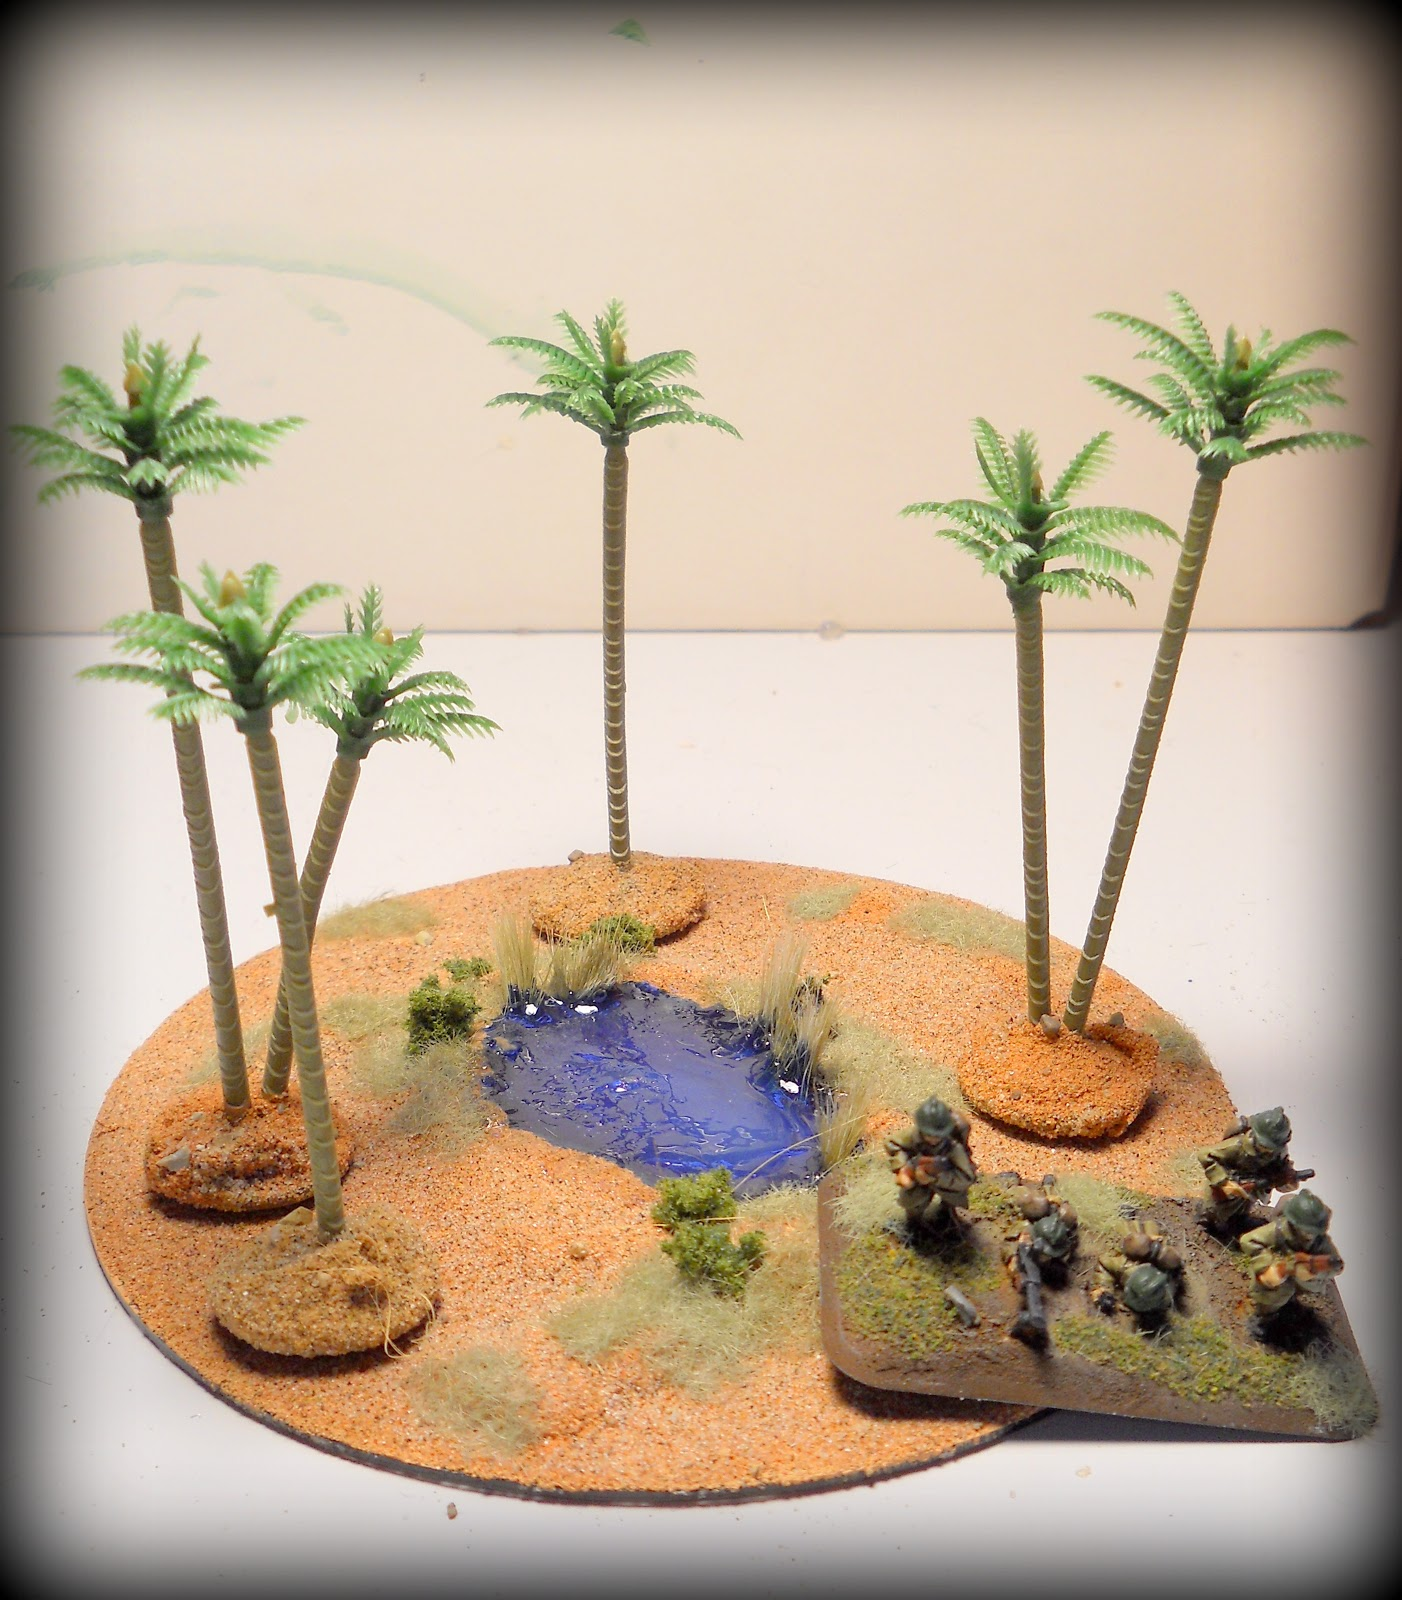 Empire of ghosts tutorial cd based desert oasis